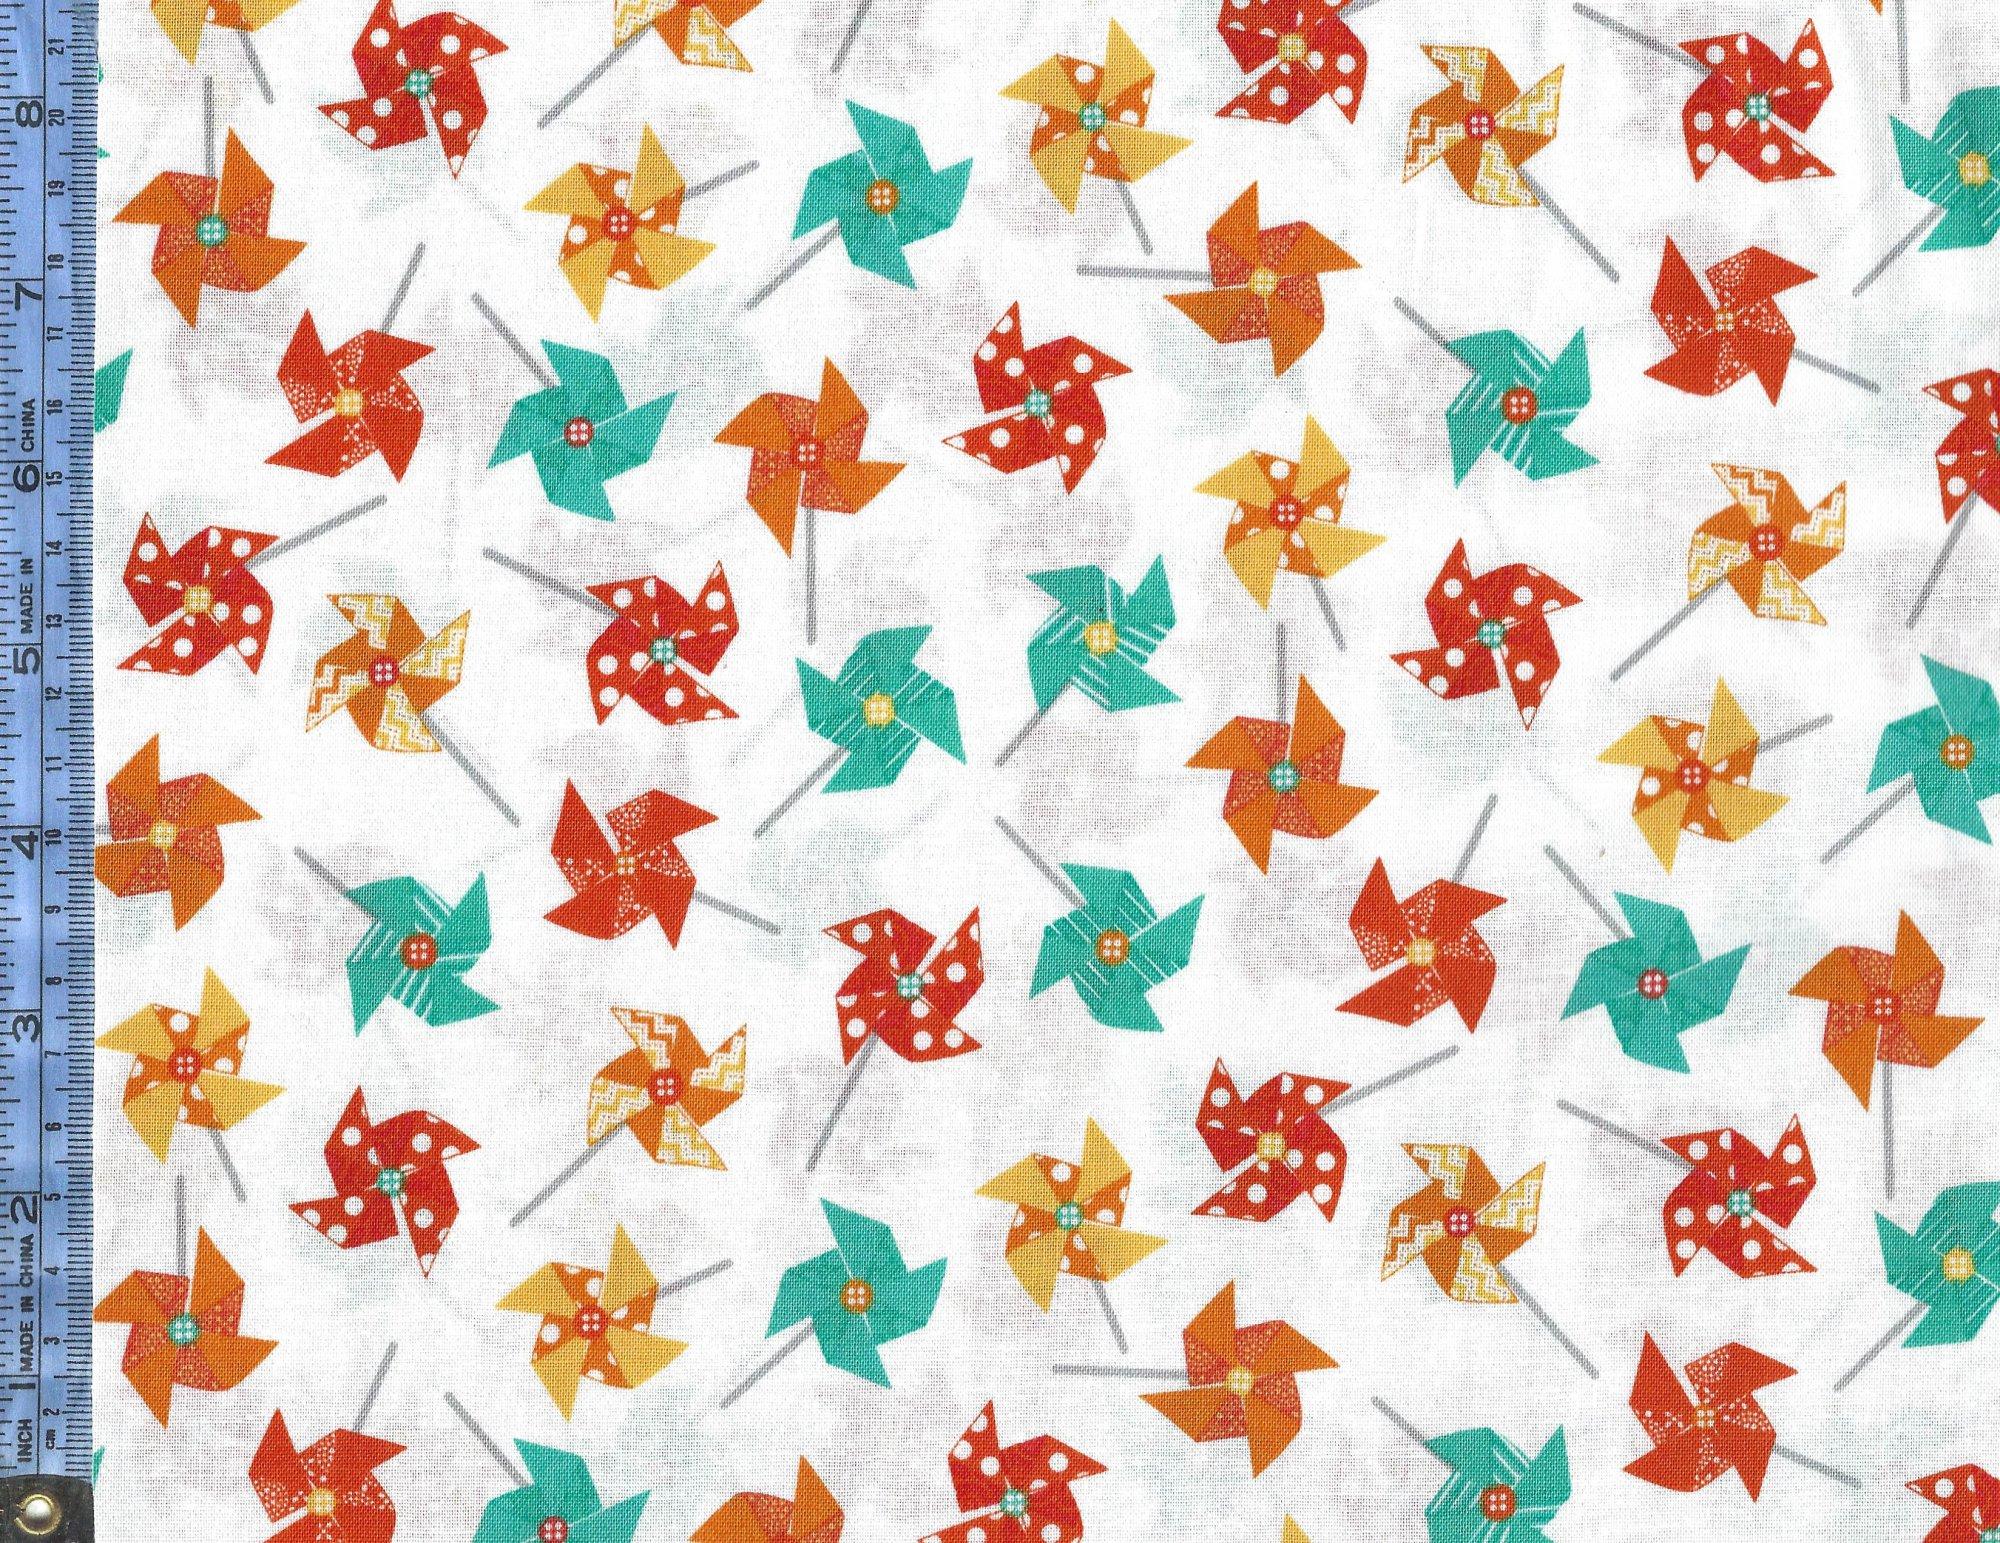 Sprinkle Sunshine - (MAS8252-O) orange yellow and teal pinwheels on white background